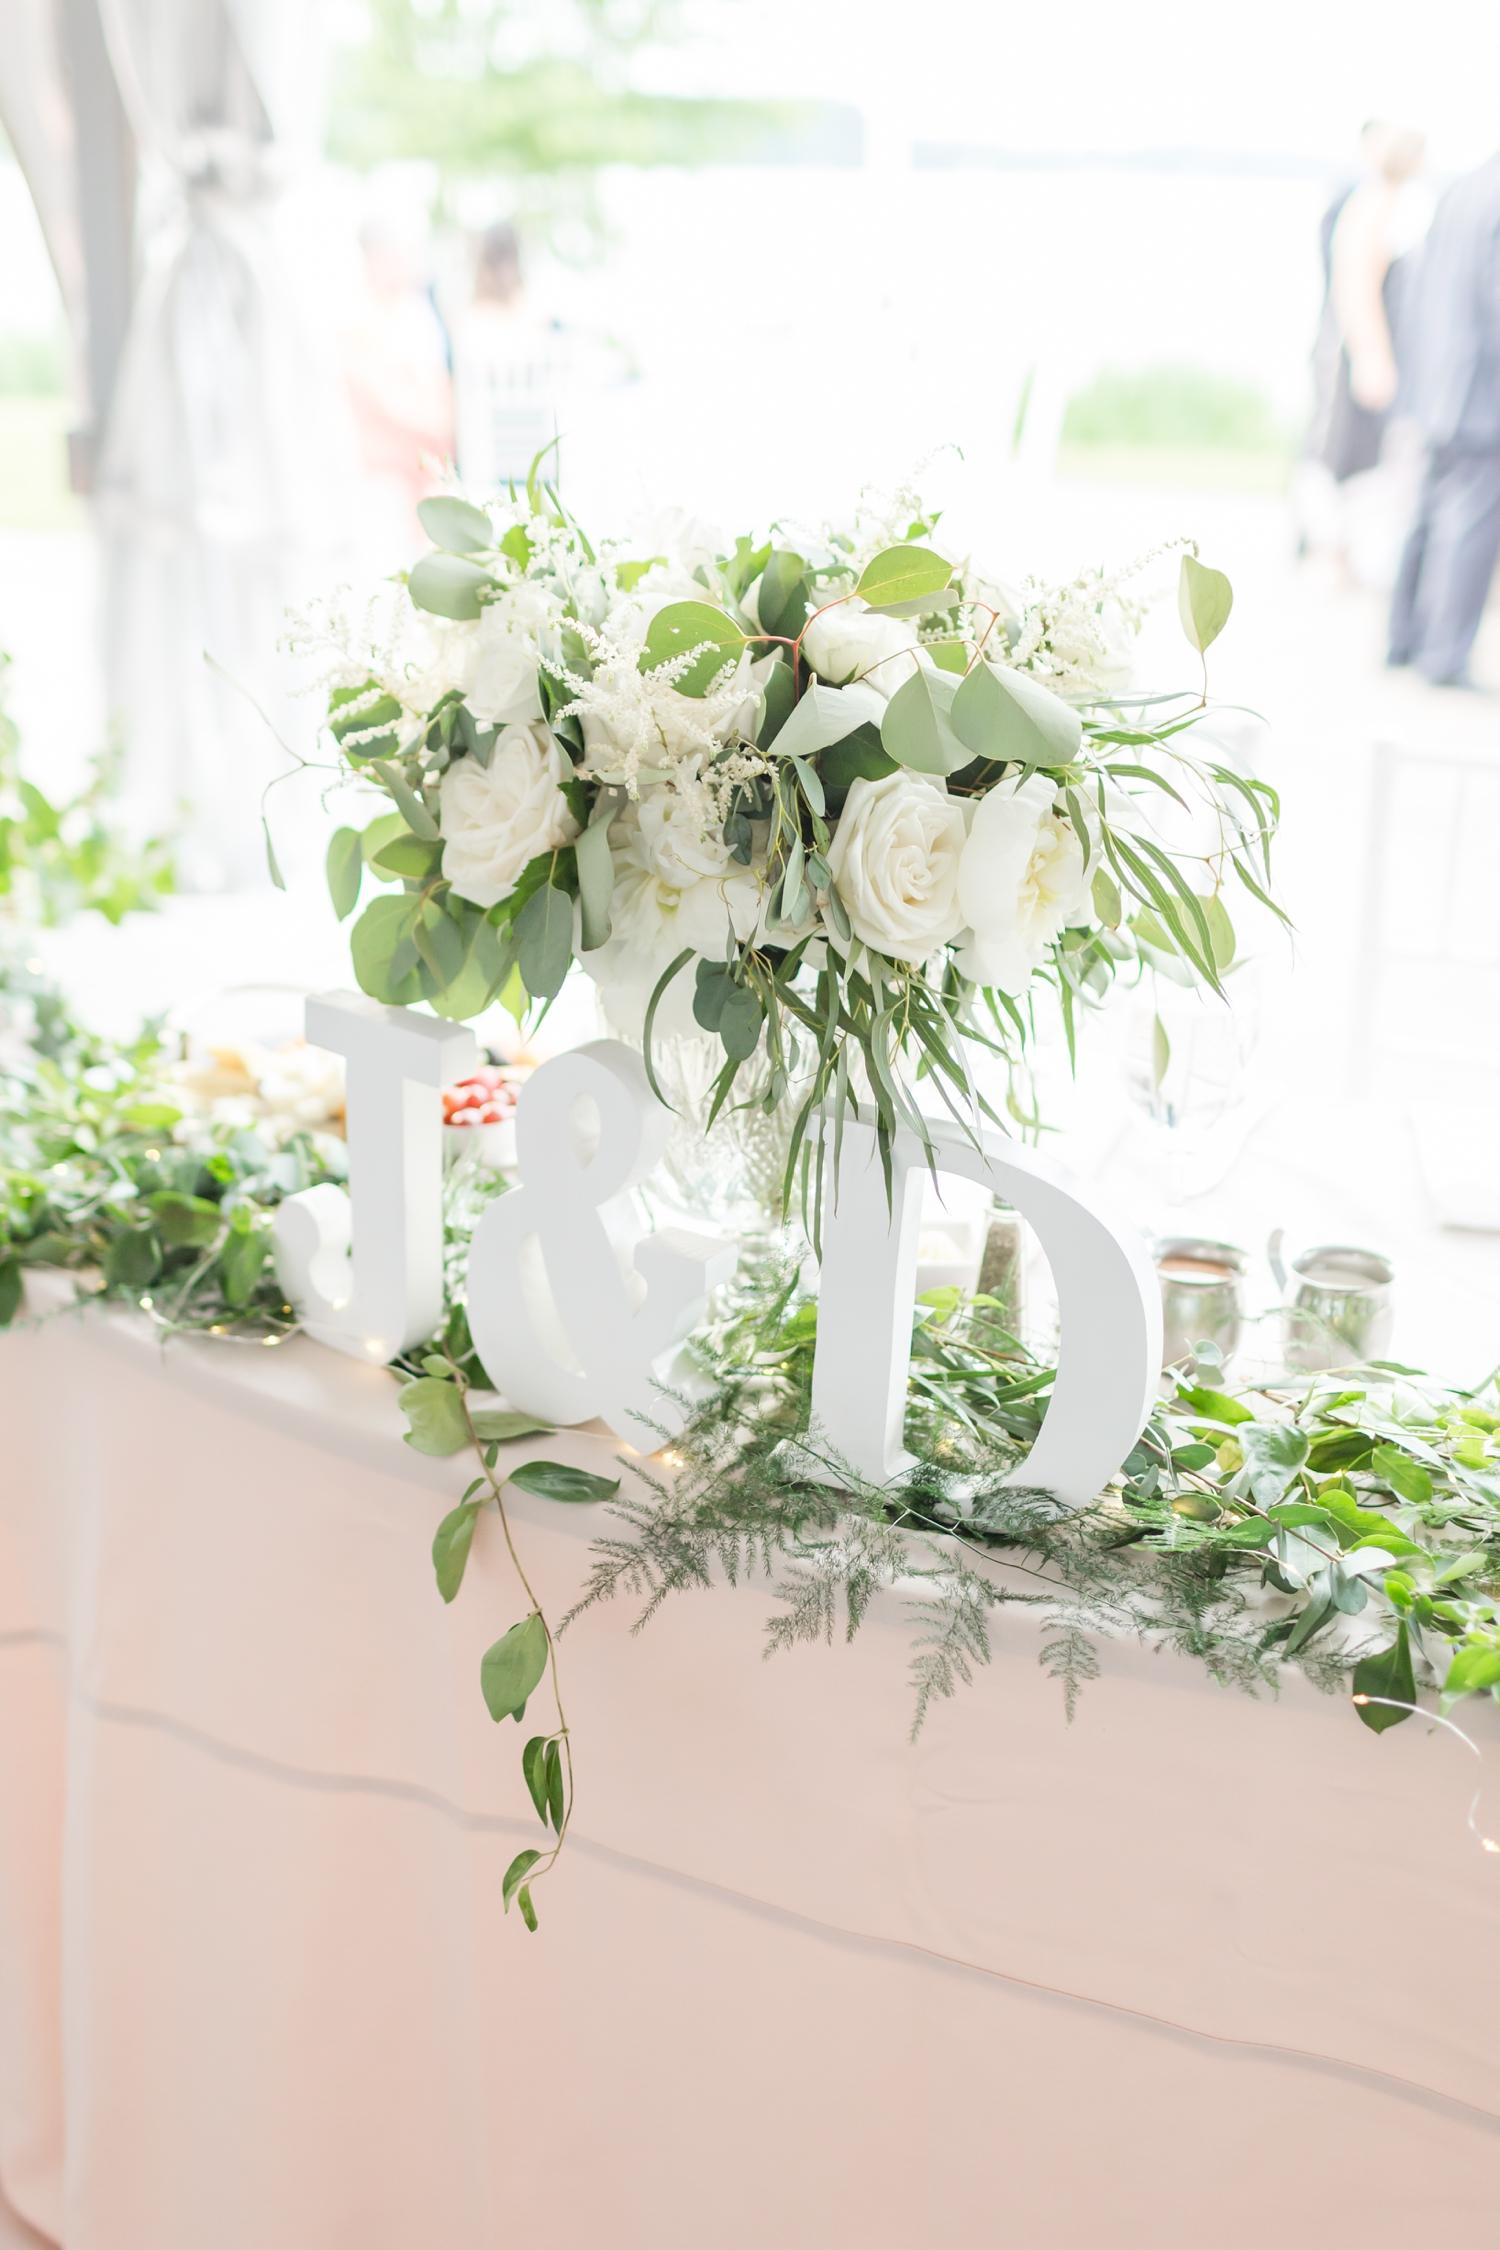 Schindler WEDDING HIGHLIGHTS-7_Herrington-on-the-Bay-wedding-Maryland-wedding-photographer-anna-grace-photography-photo.jpg